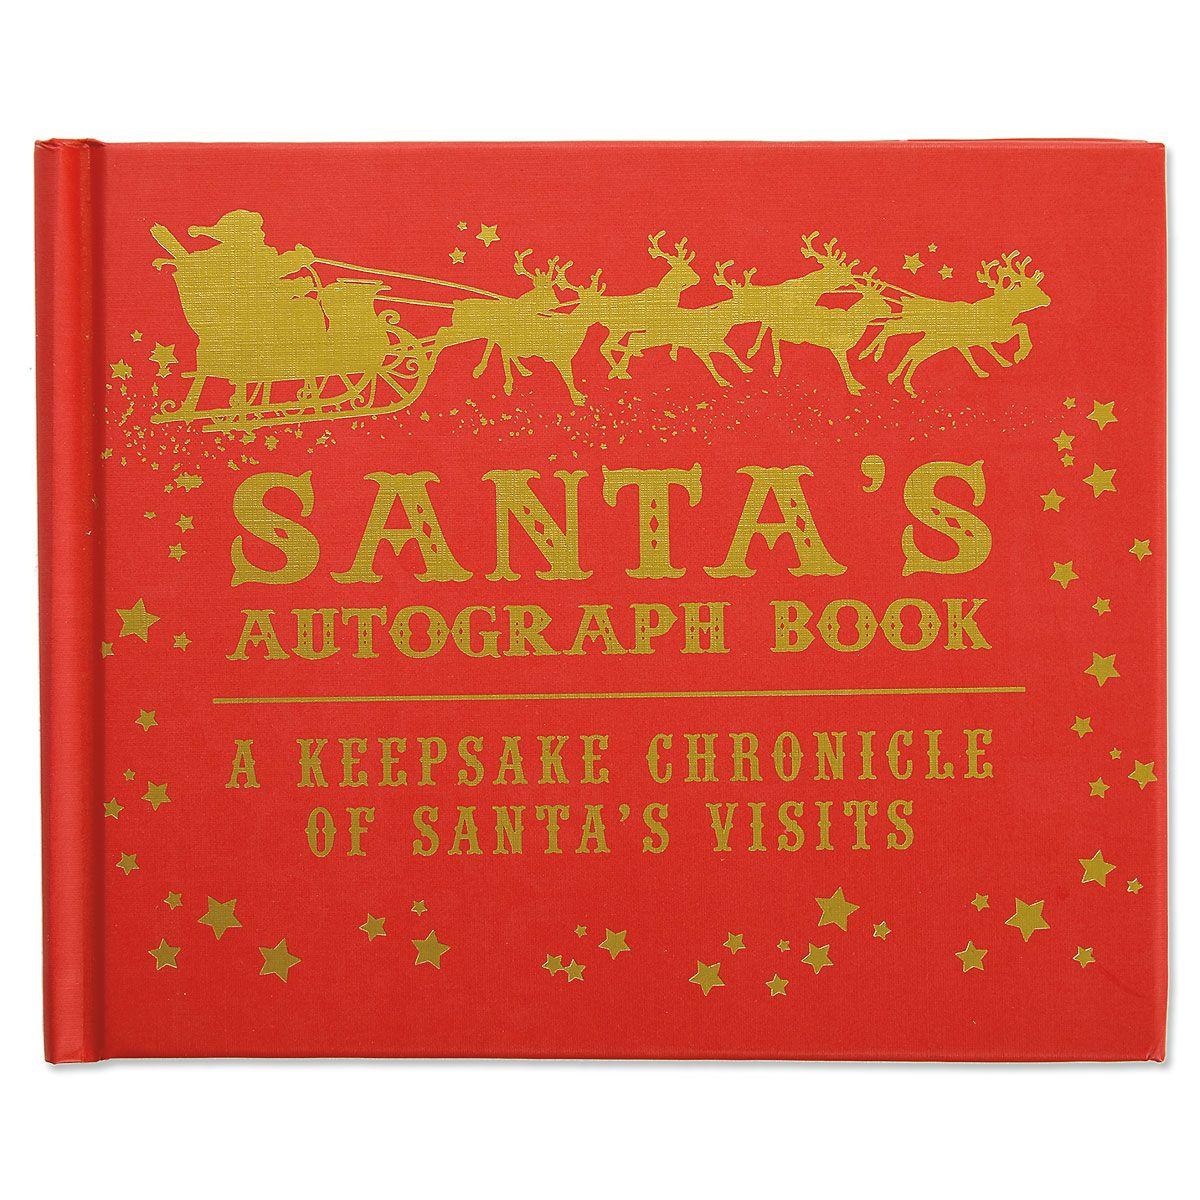 Santa's Autograph Book